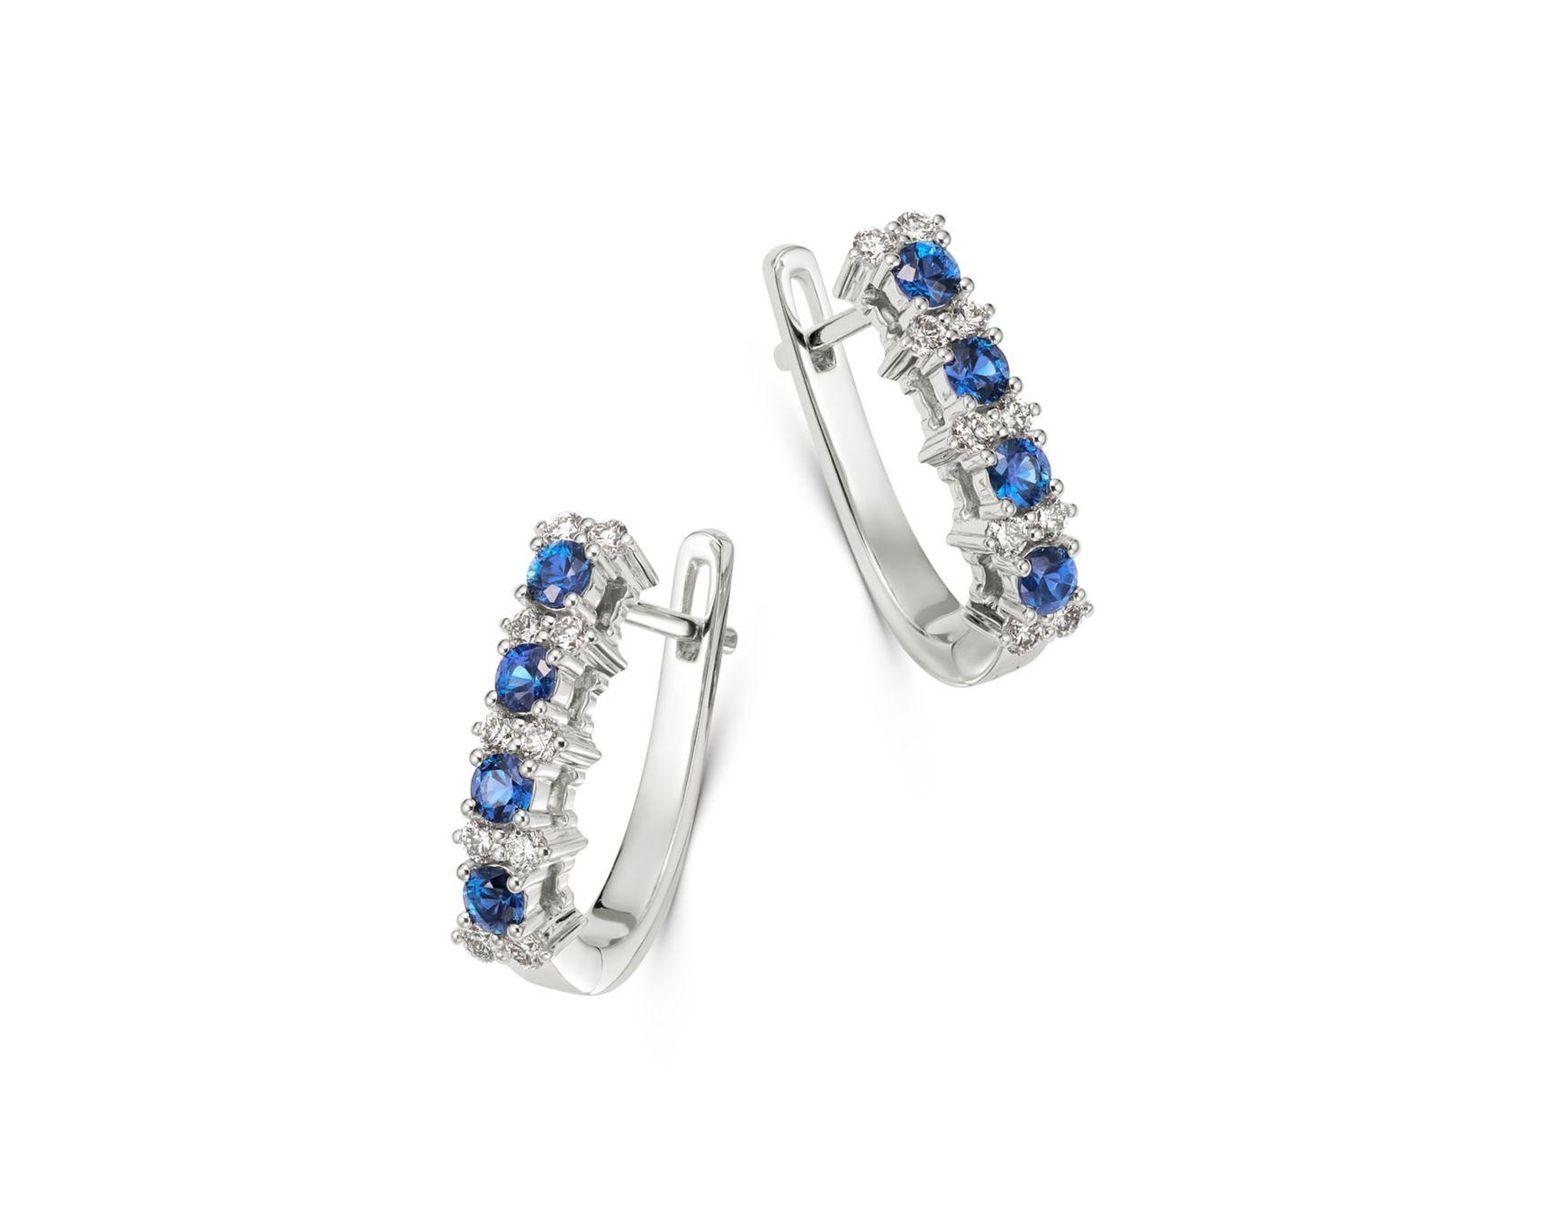 4e951d65c348d Women's Diamond & Blue Sapphire Oval Hoop Earrings In 14k White Gold